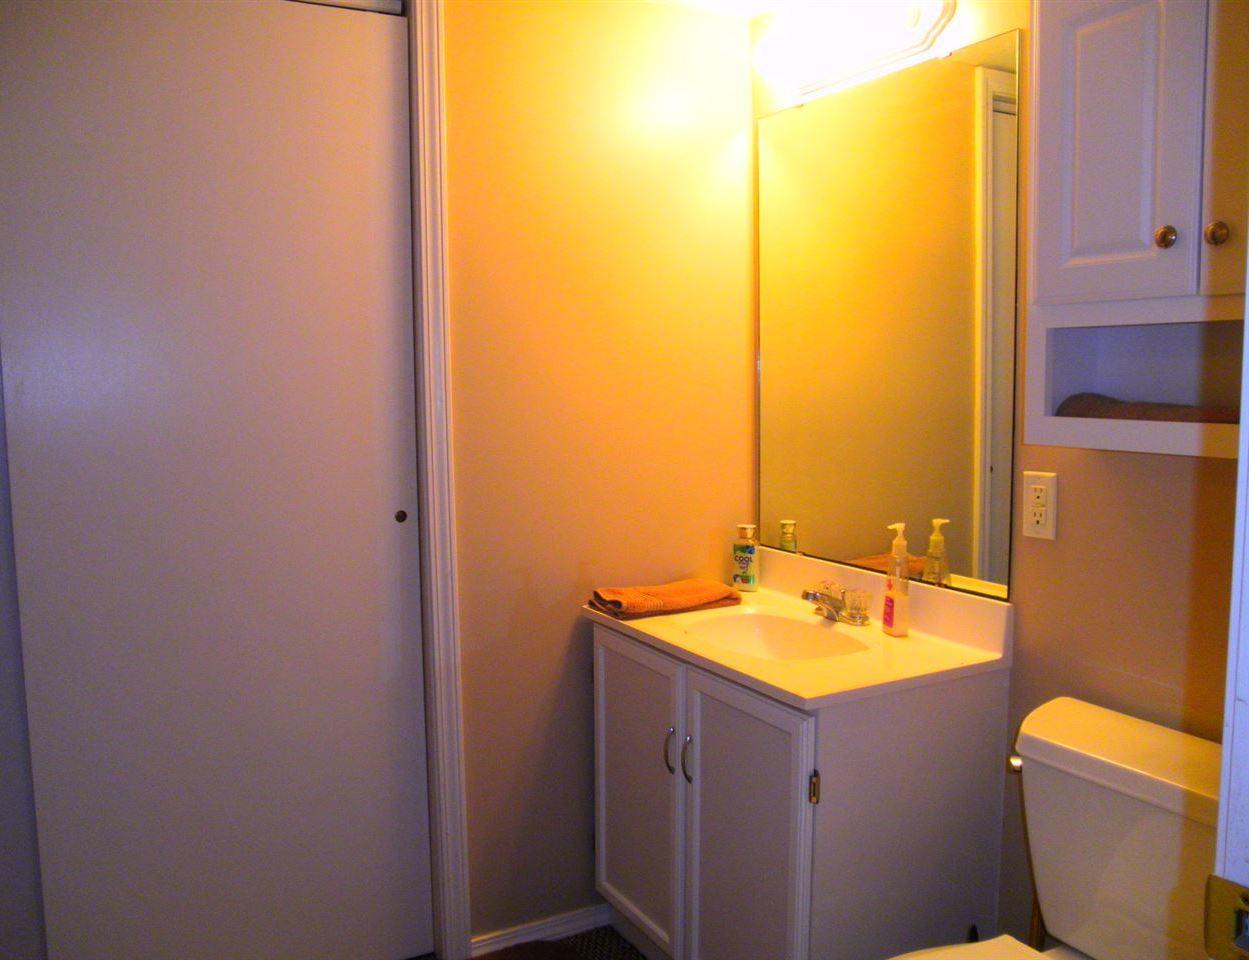 Sold Cross Sale W/ MLS | 32 Raintree Ponca City, OK 74604 24